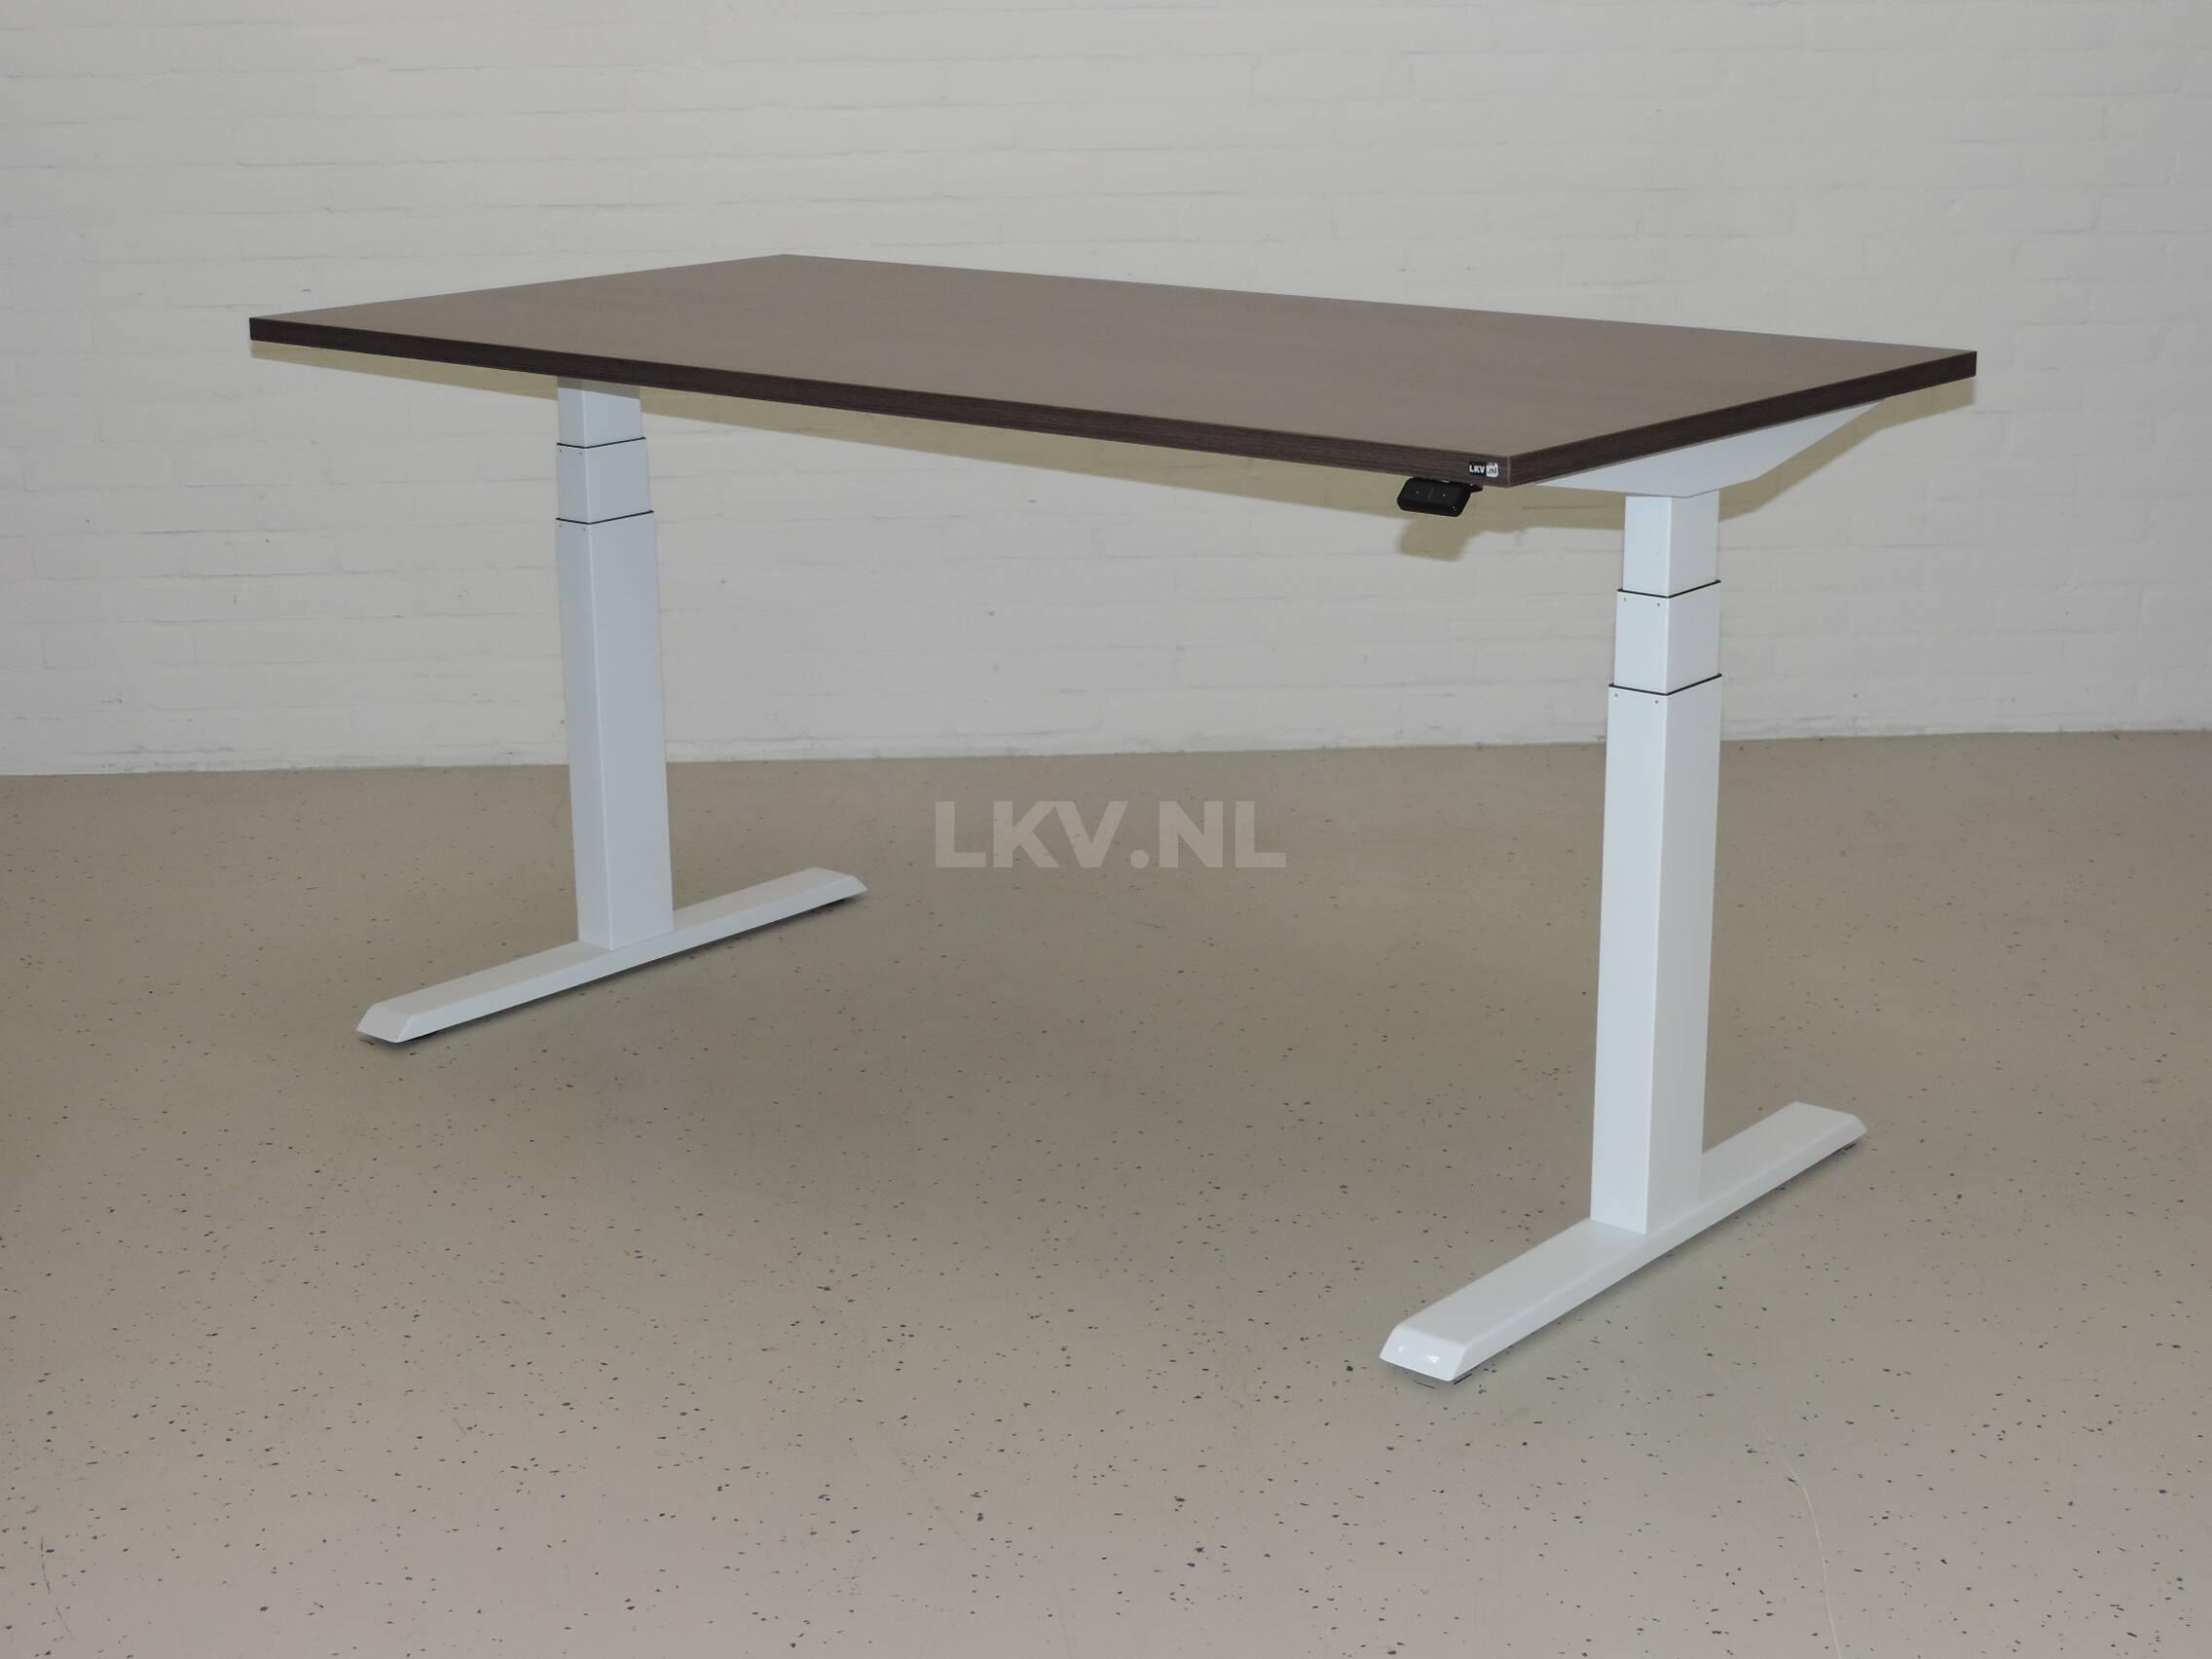 Zit-sta bureau GT-SF met wit frame en eiken donker blad - hoogste stand